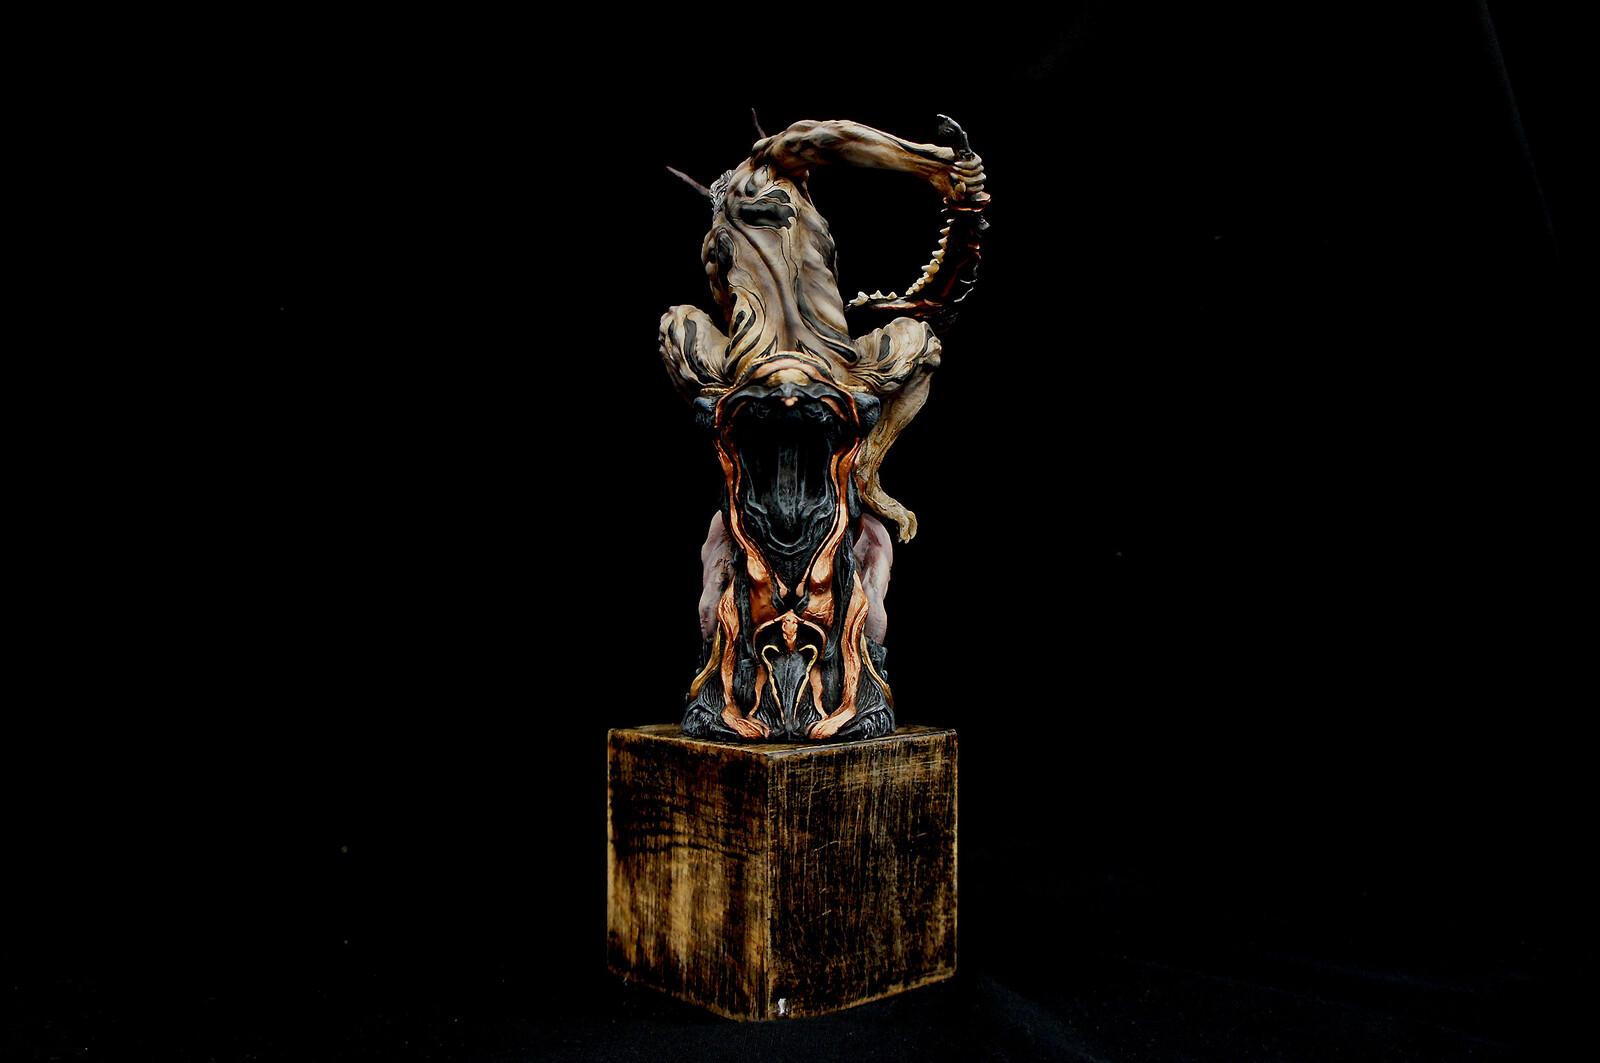 The Alastor Art Statue